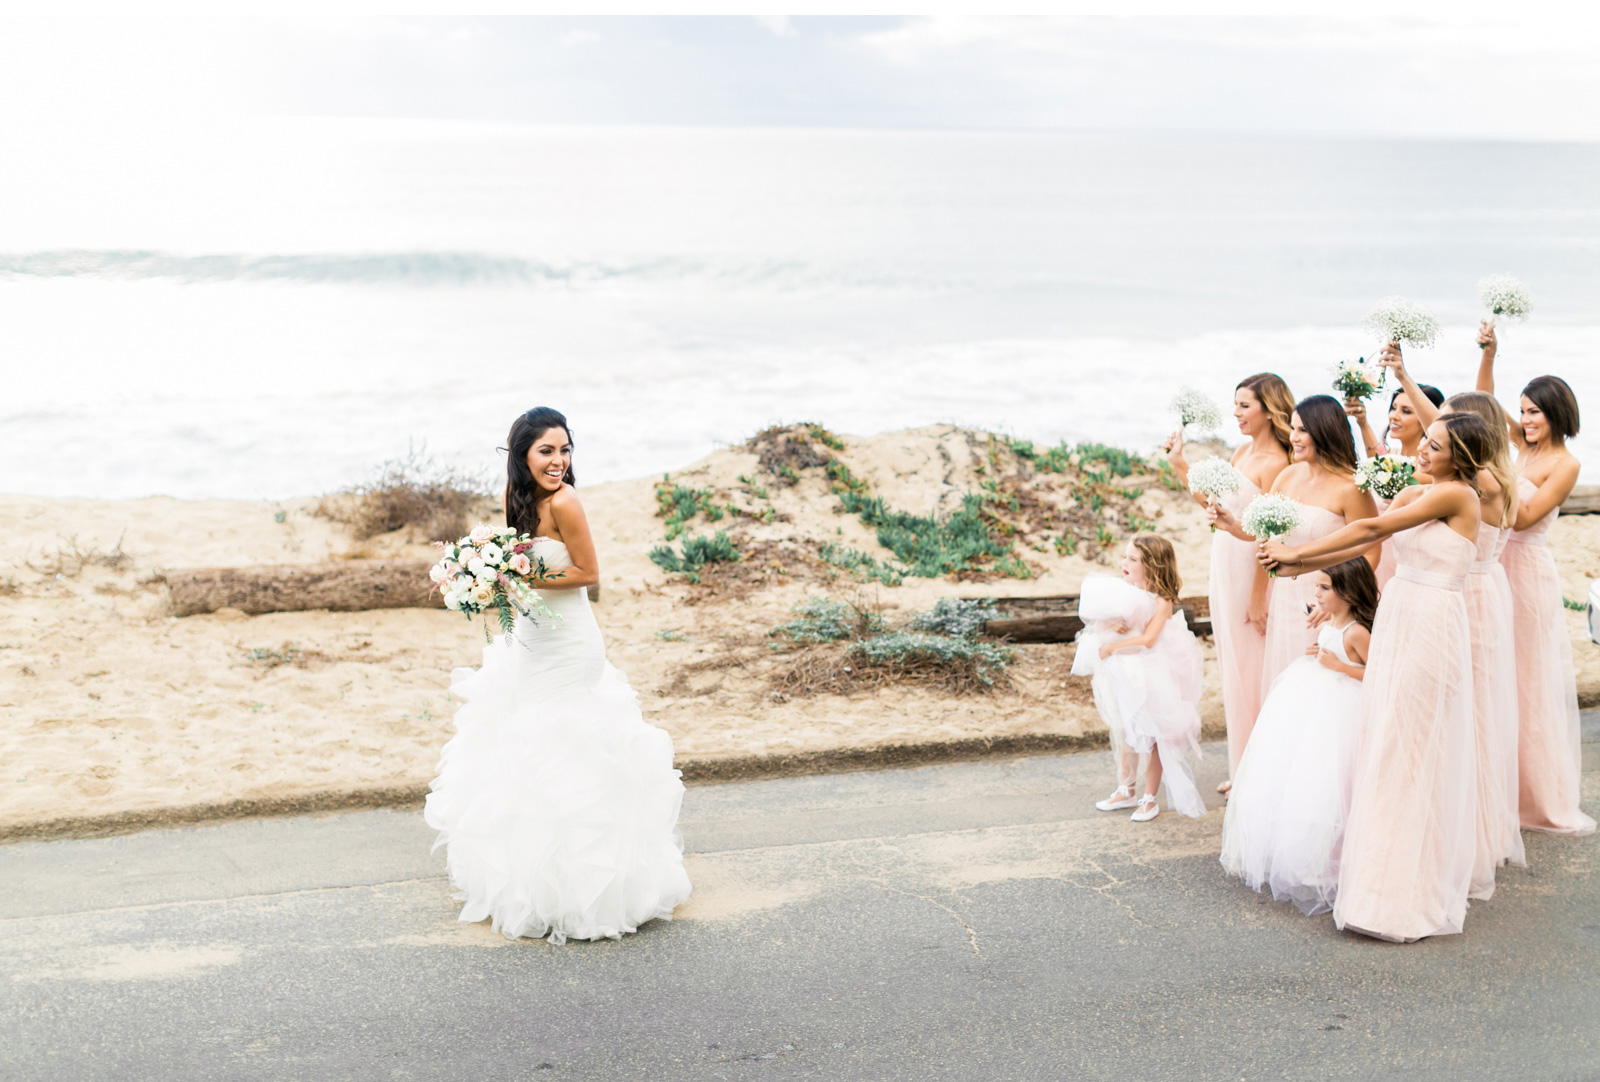 Malibu-First-Look-Natalie-Schutt-Photography-Rod-Brewster_05.jpg